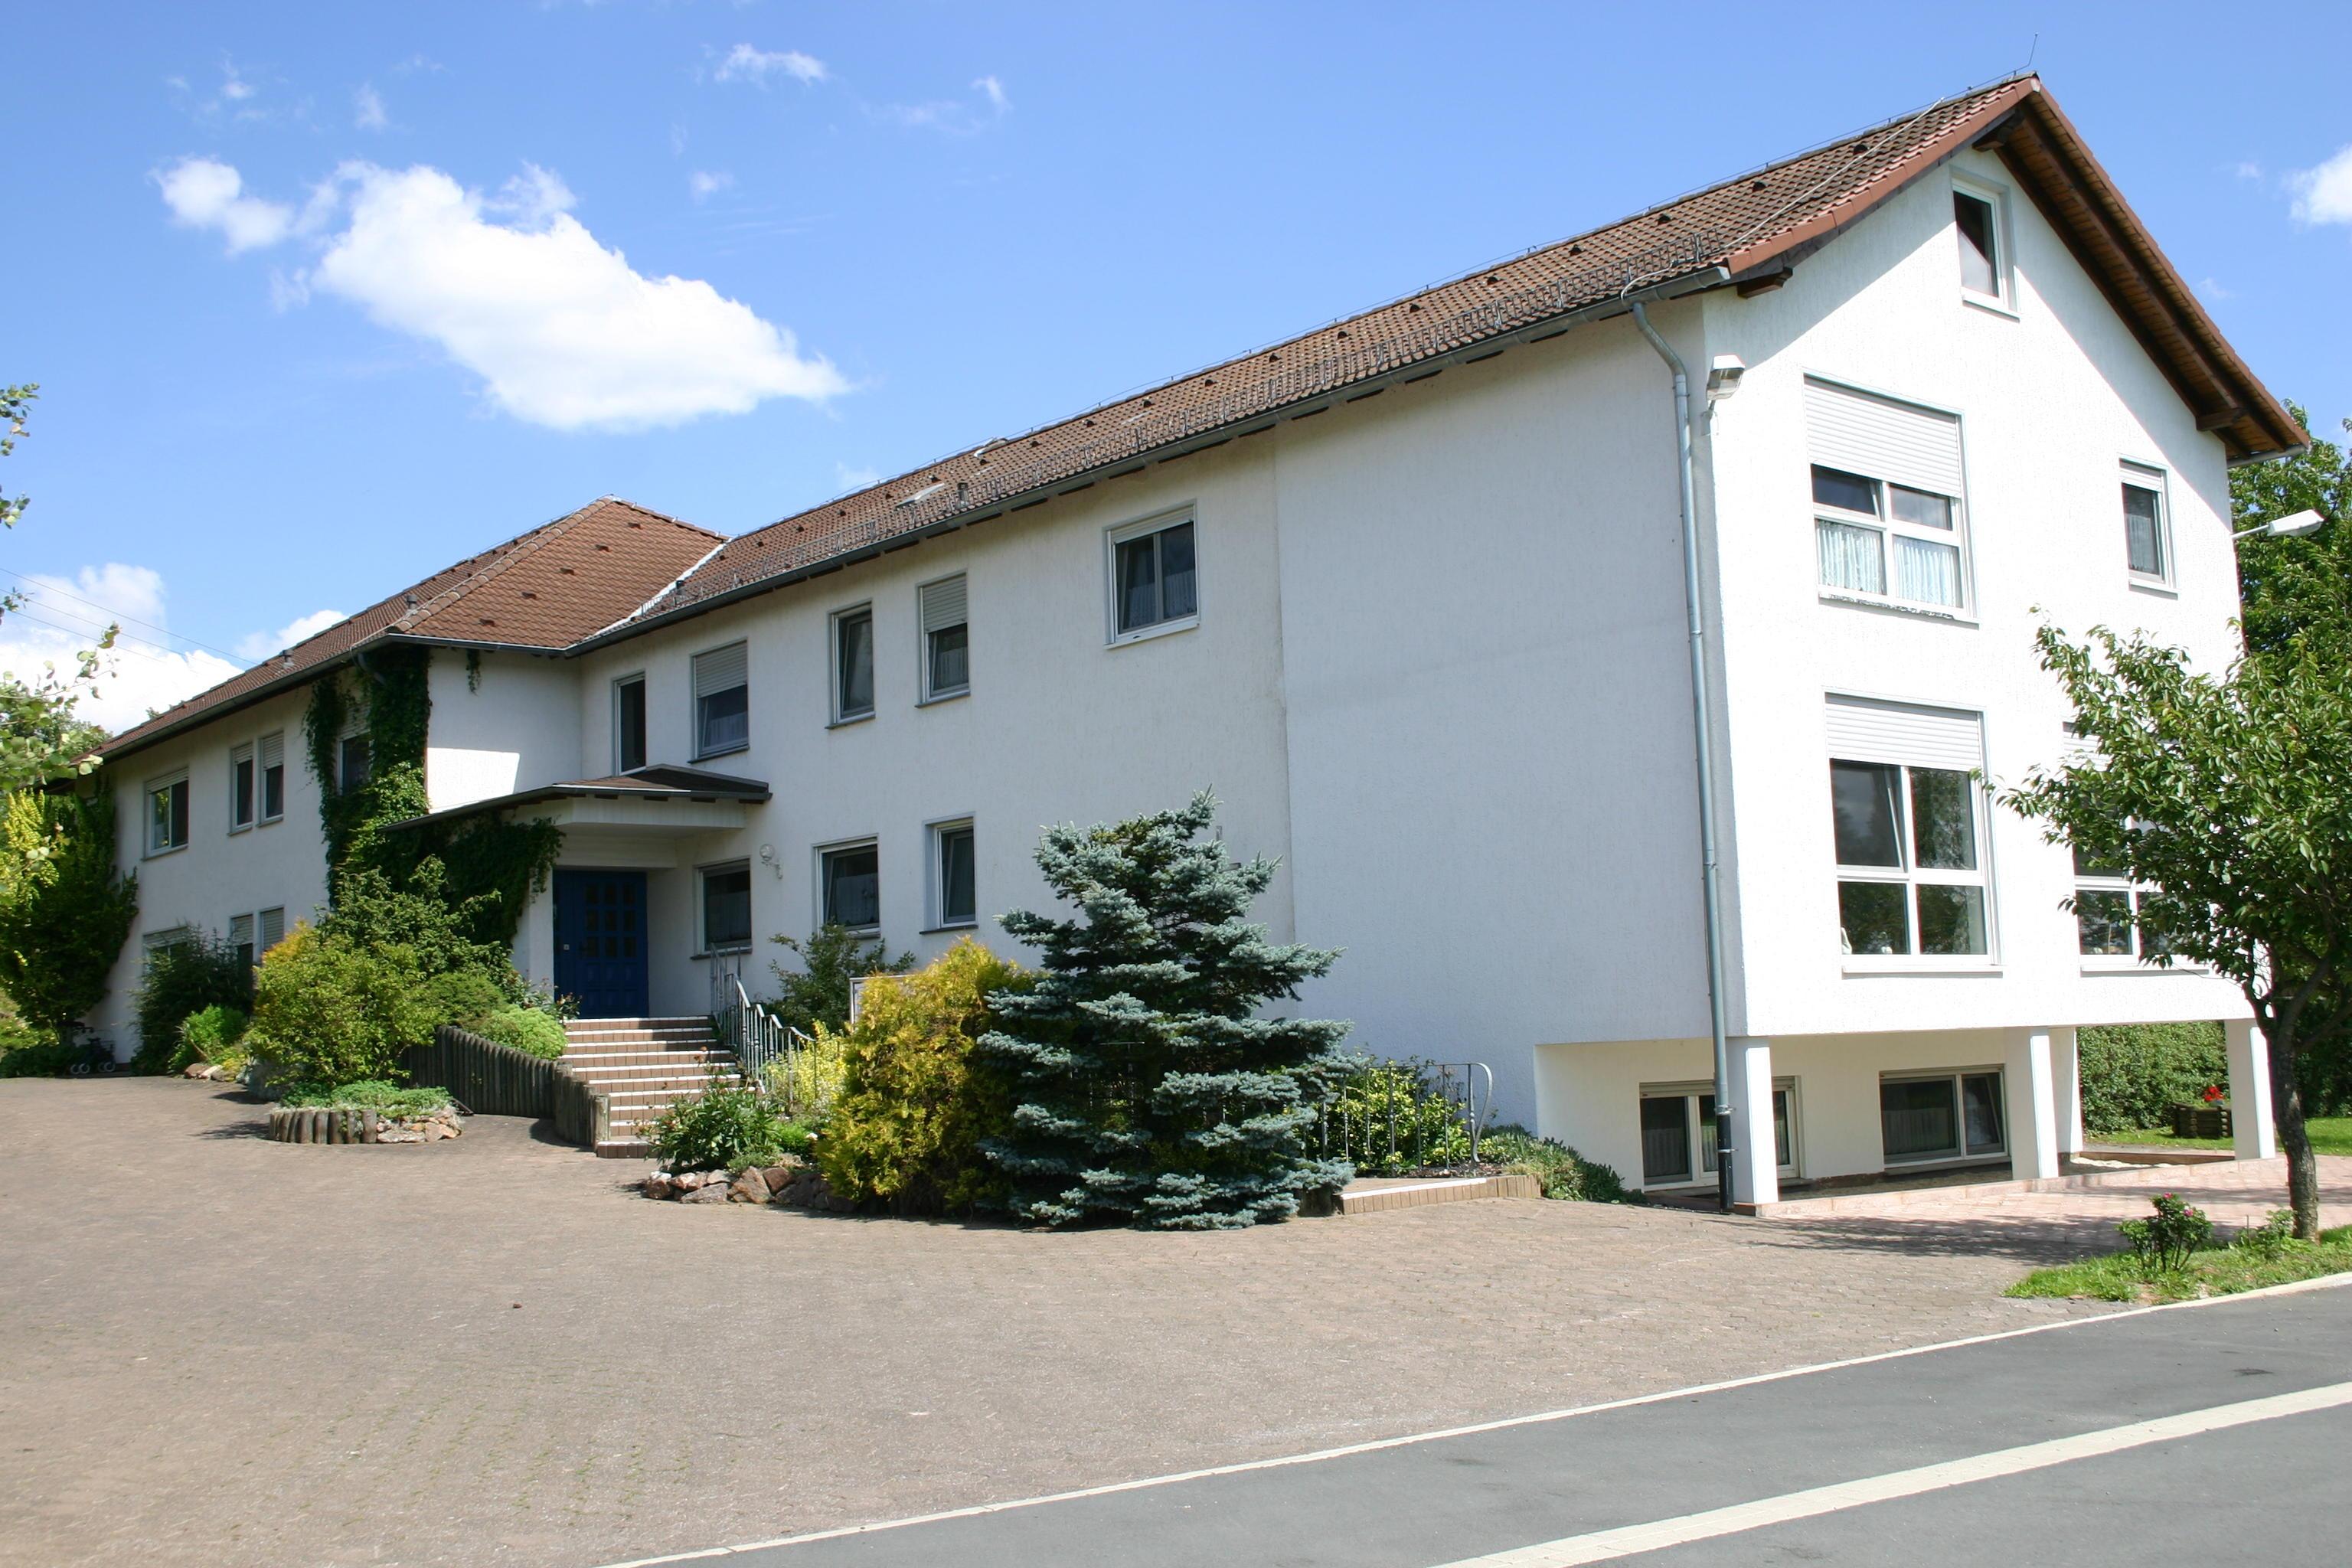 Seniorenresidenz Goddelsheim